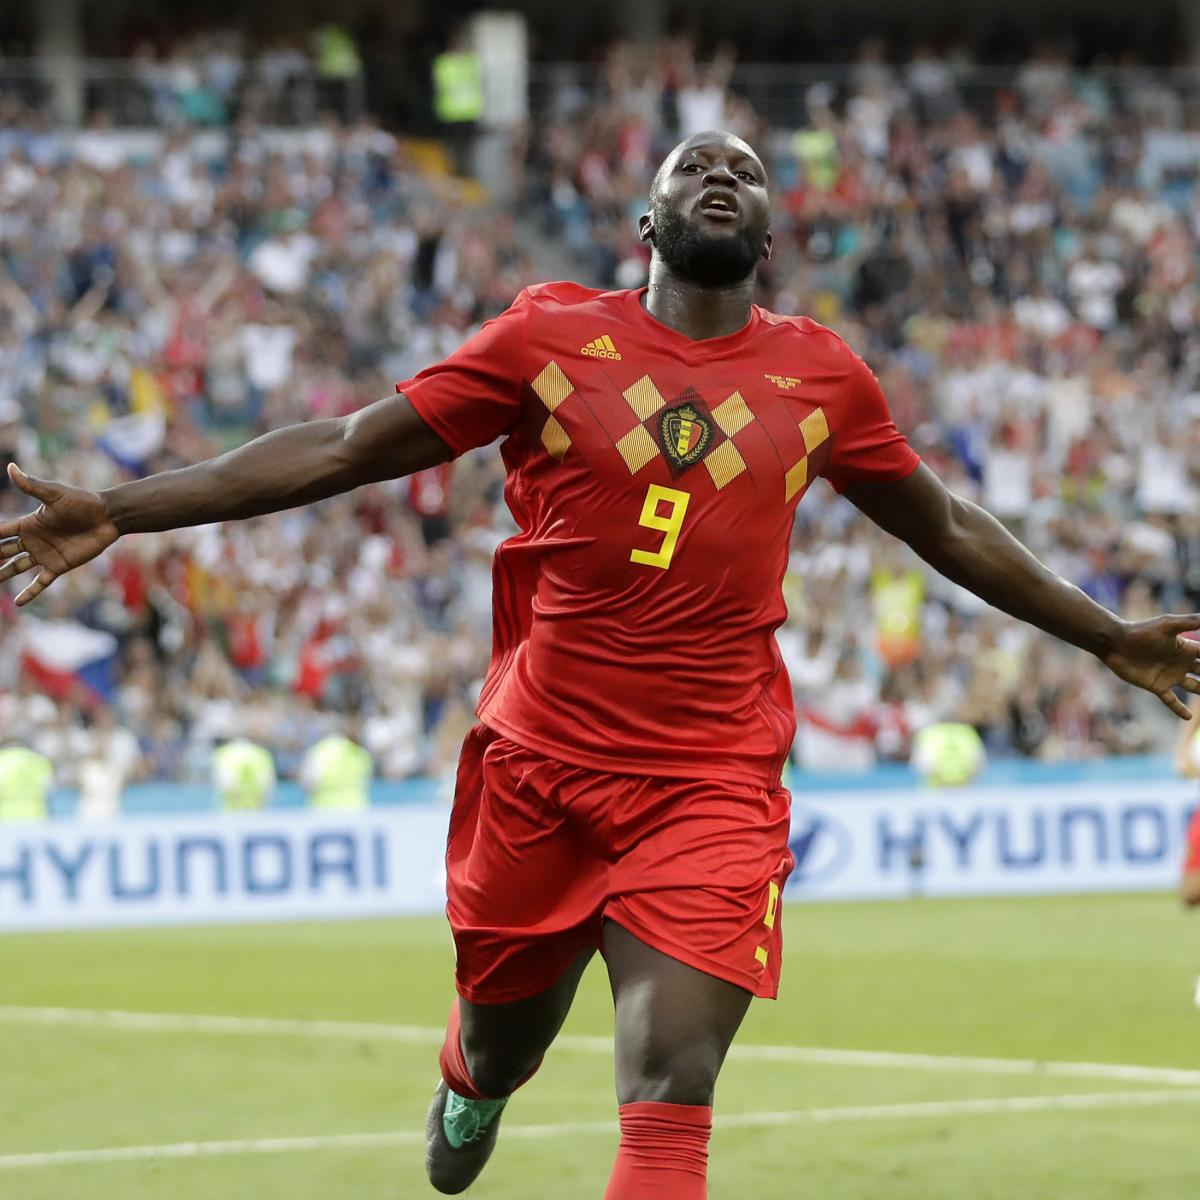 b424e5ef3 Romelu Lukaku Brace Leads Belgium Past Panama in 3-0 World Cup Win ...